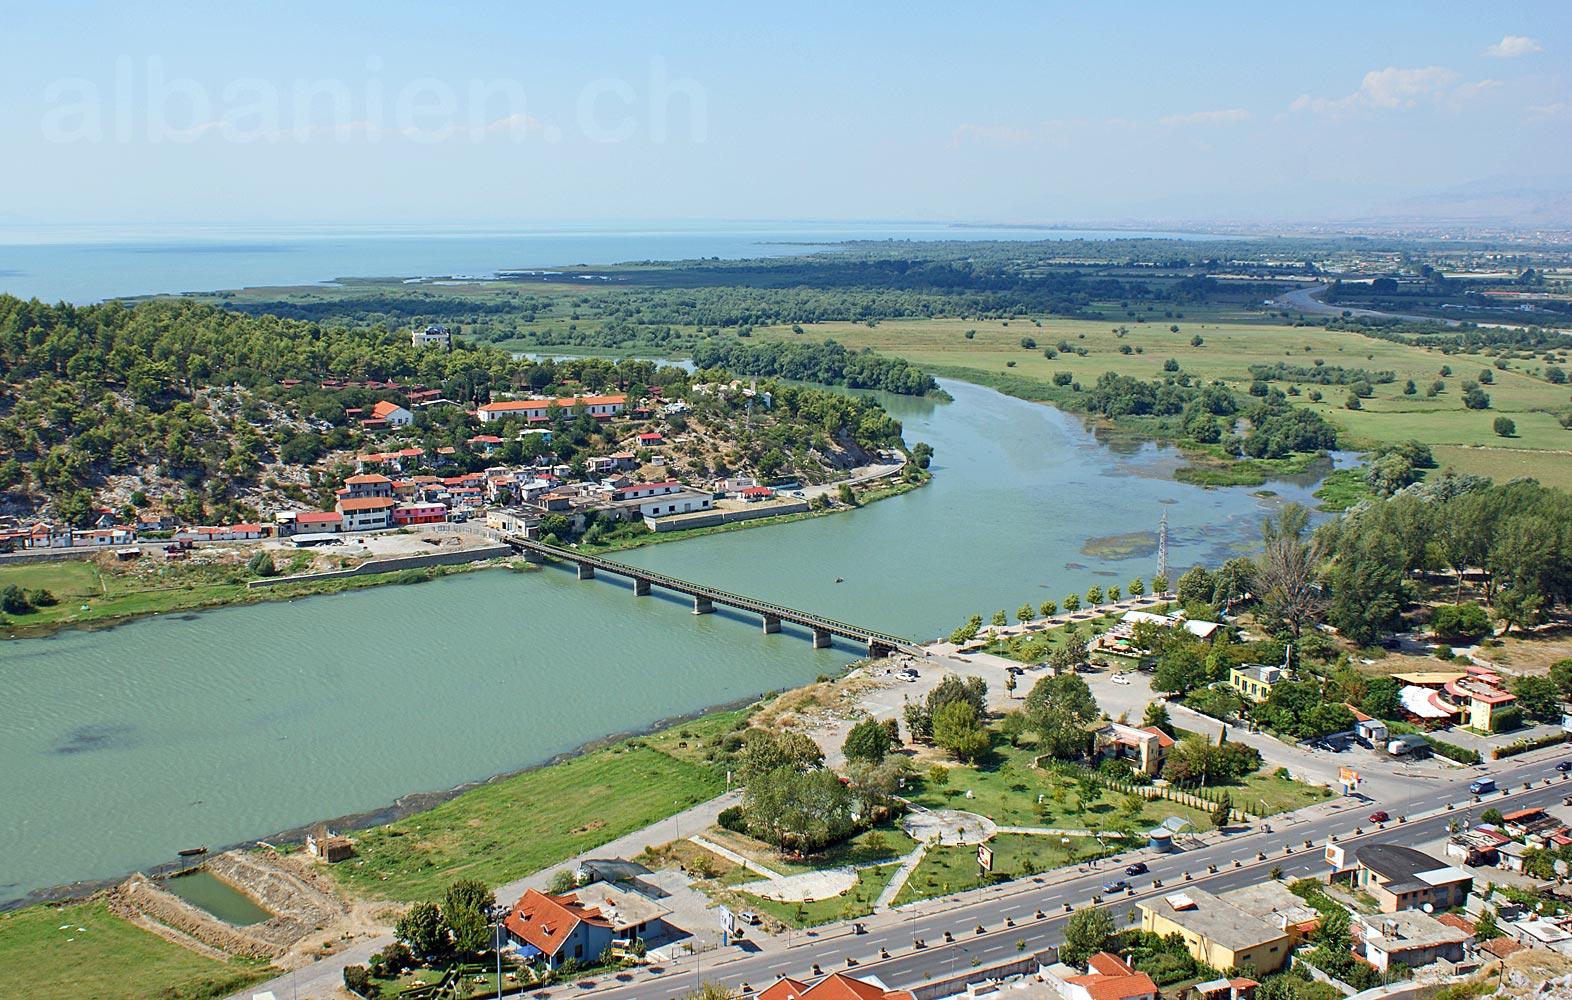 Shkodra Bunabrücke